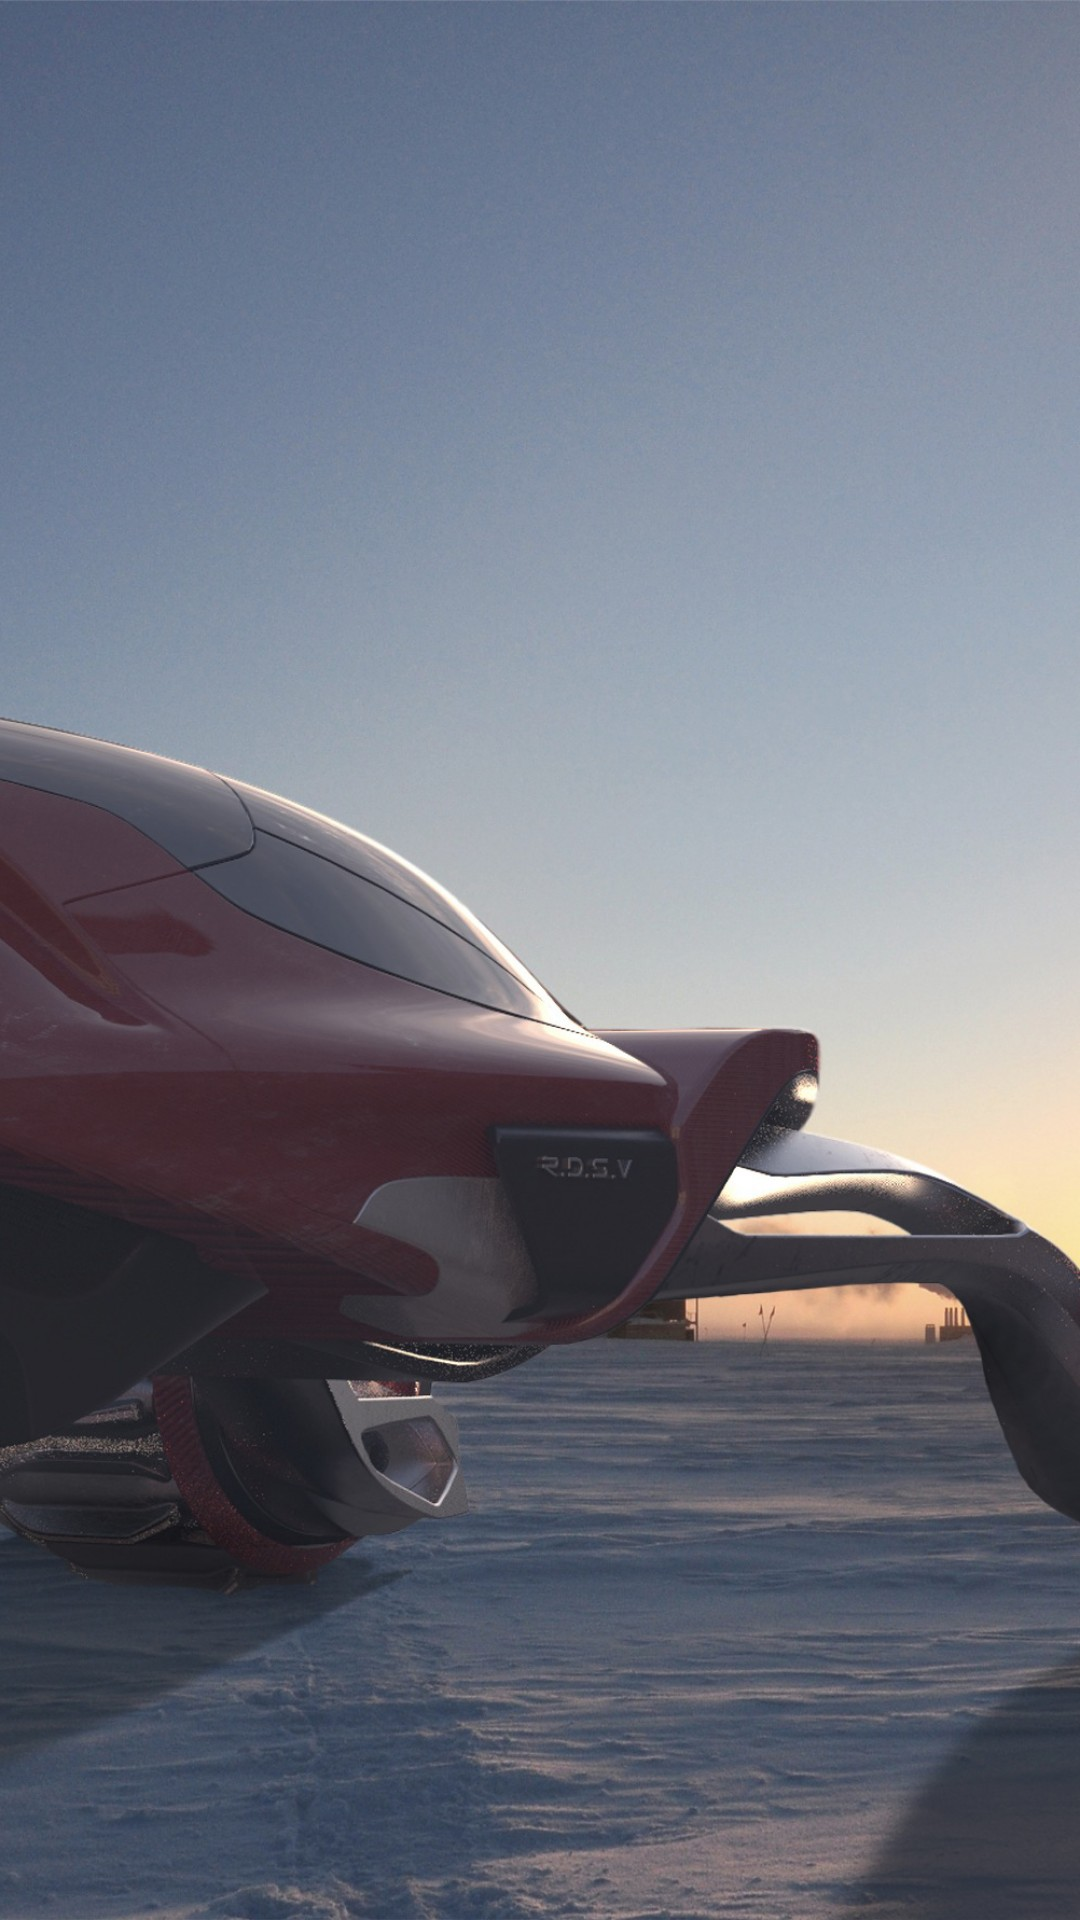 Wallpaper RDSV, Rapid Deployment Snow Vehicle, concept ...